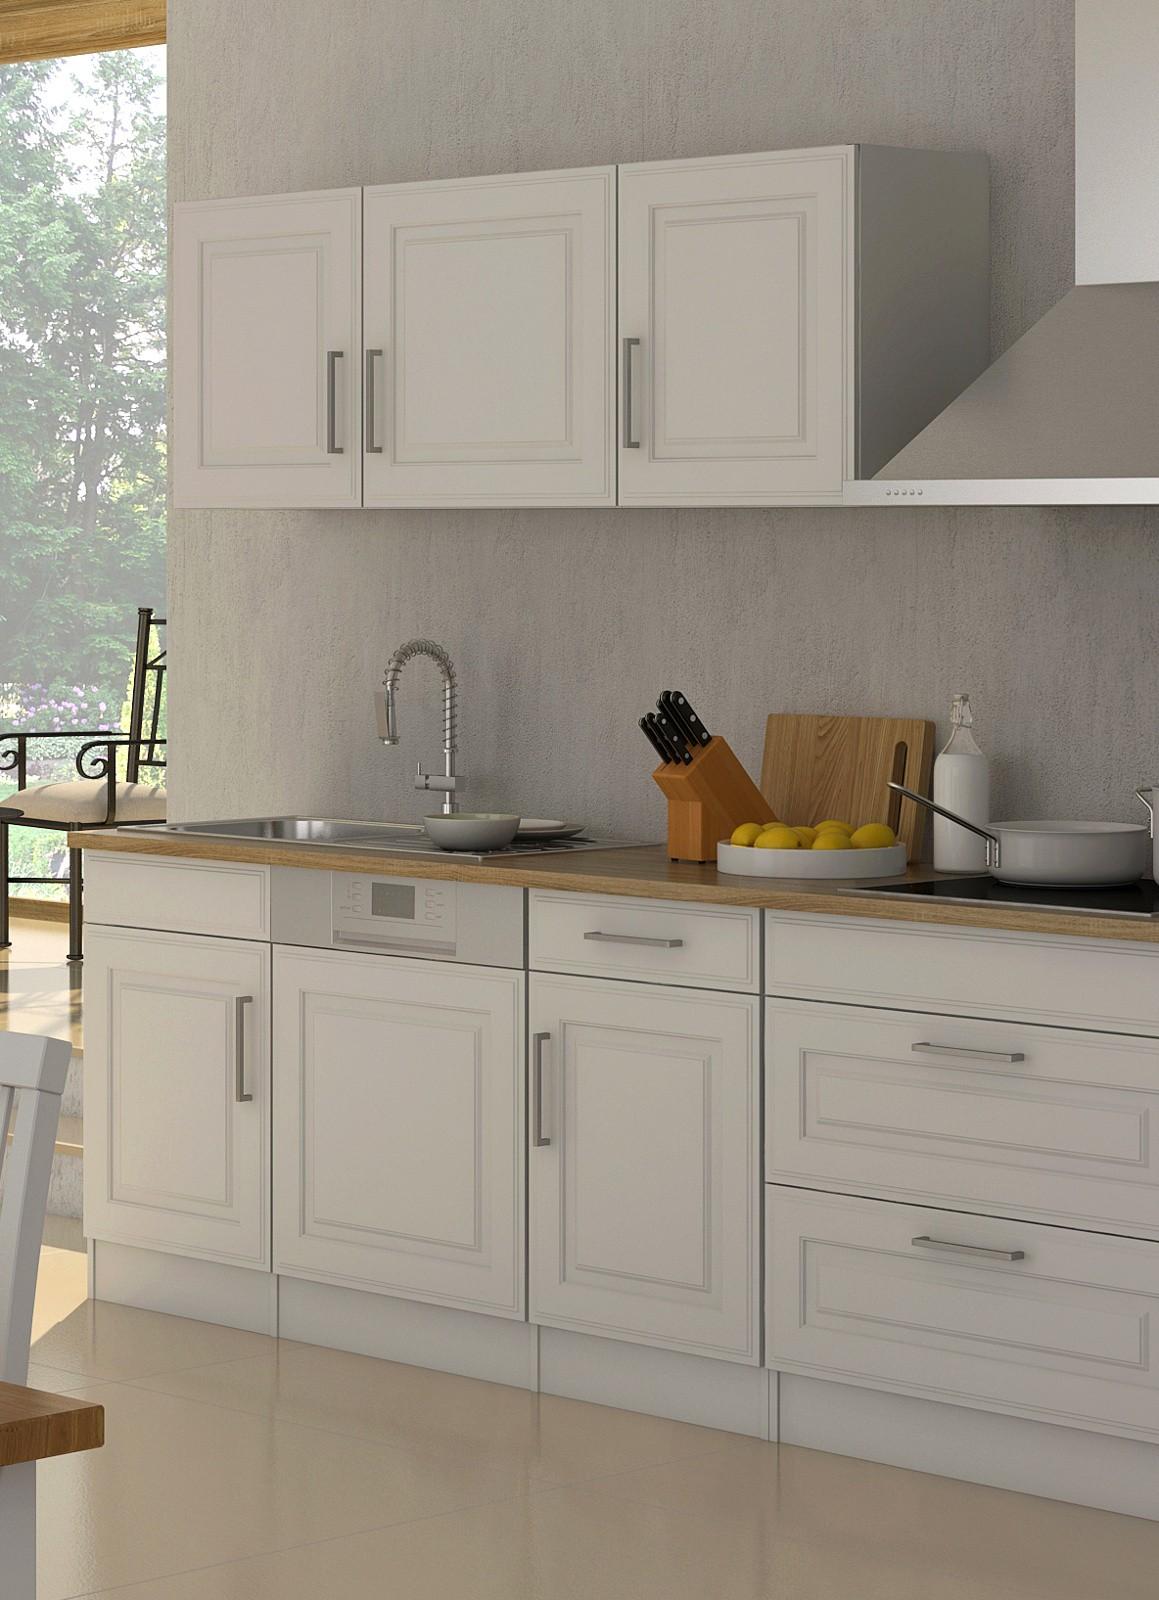 Küchenblock Mit Geräten k chenblock mit e ger ten eur 1